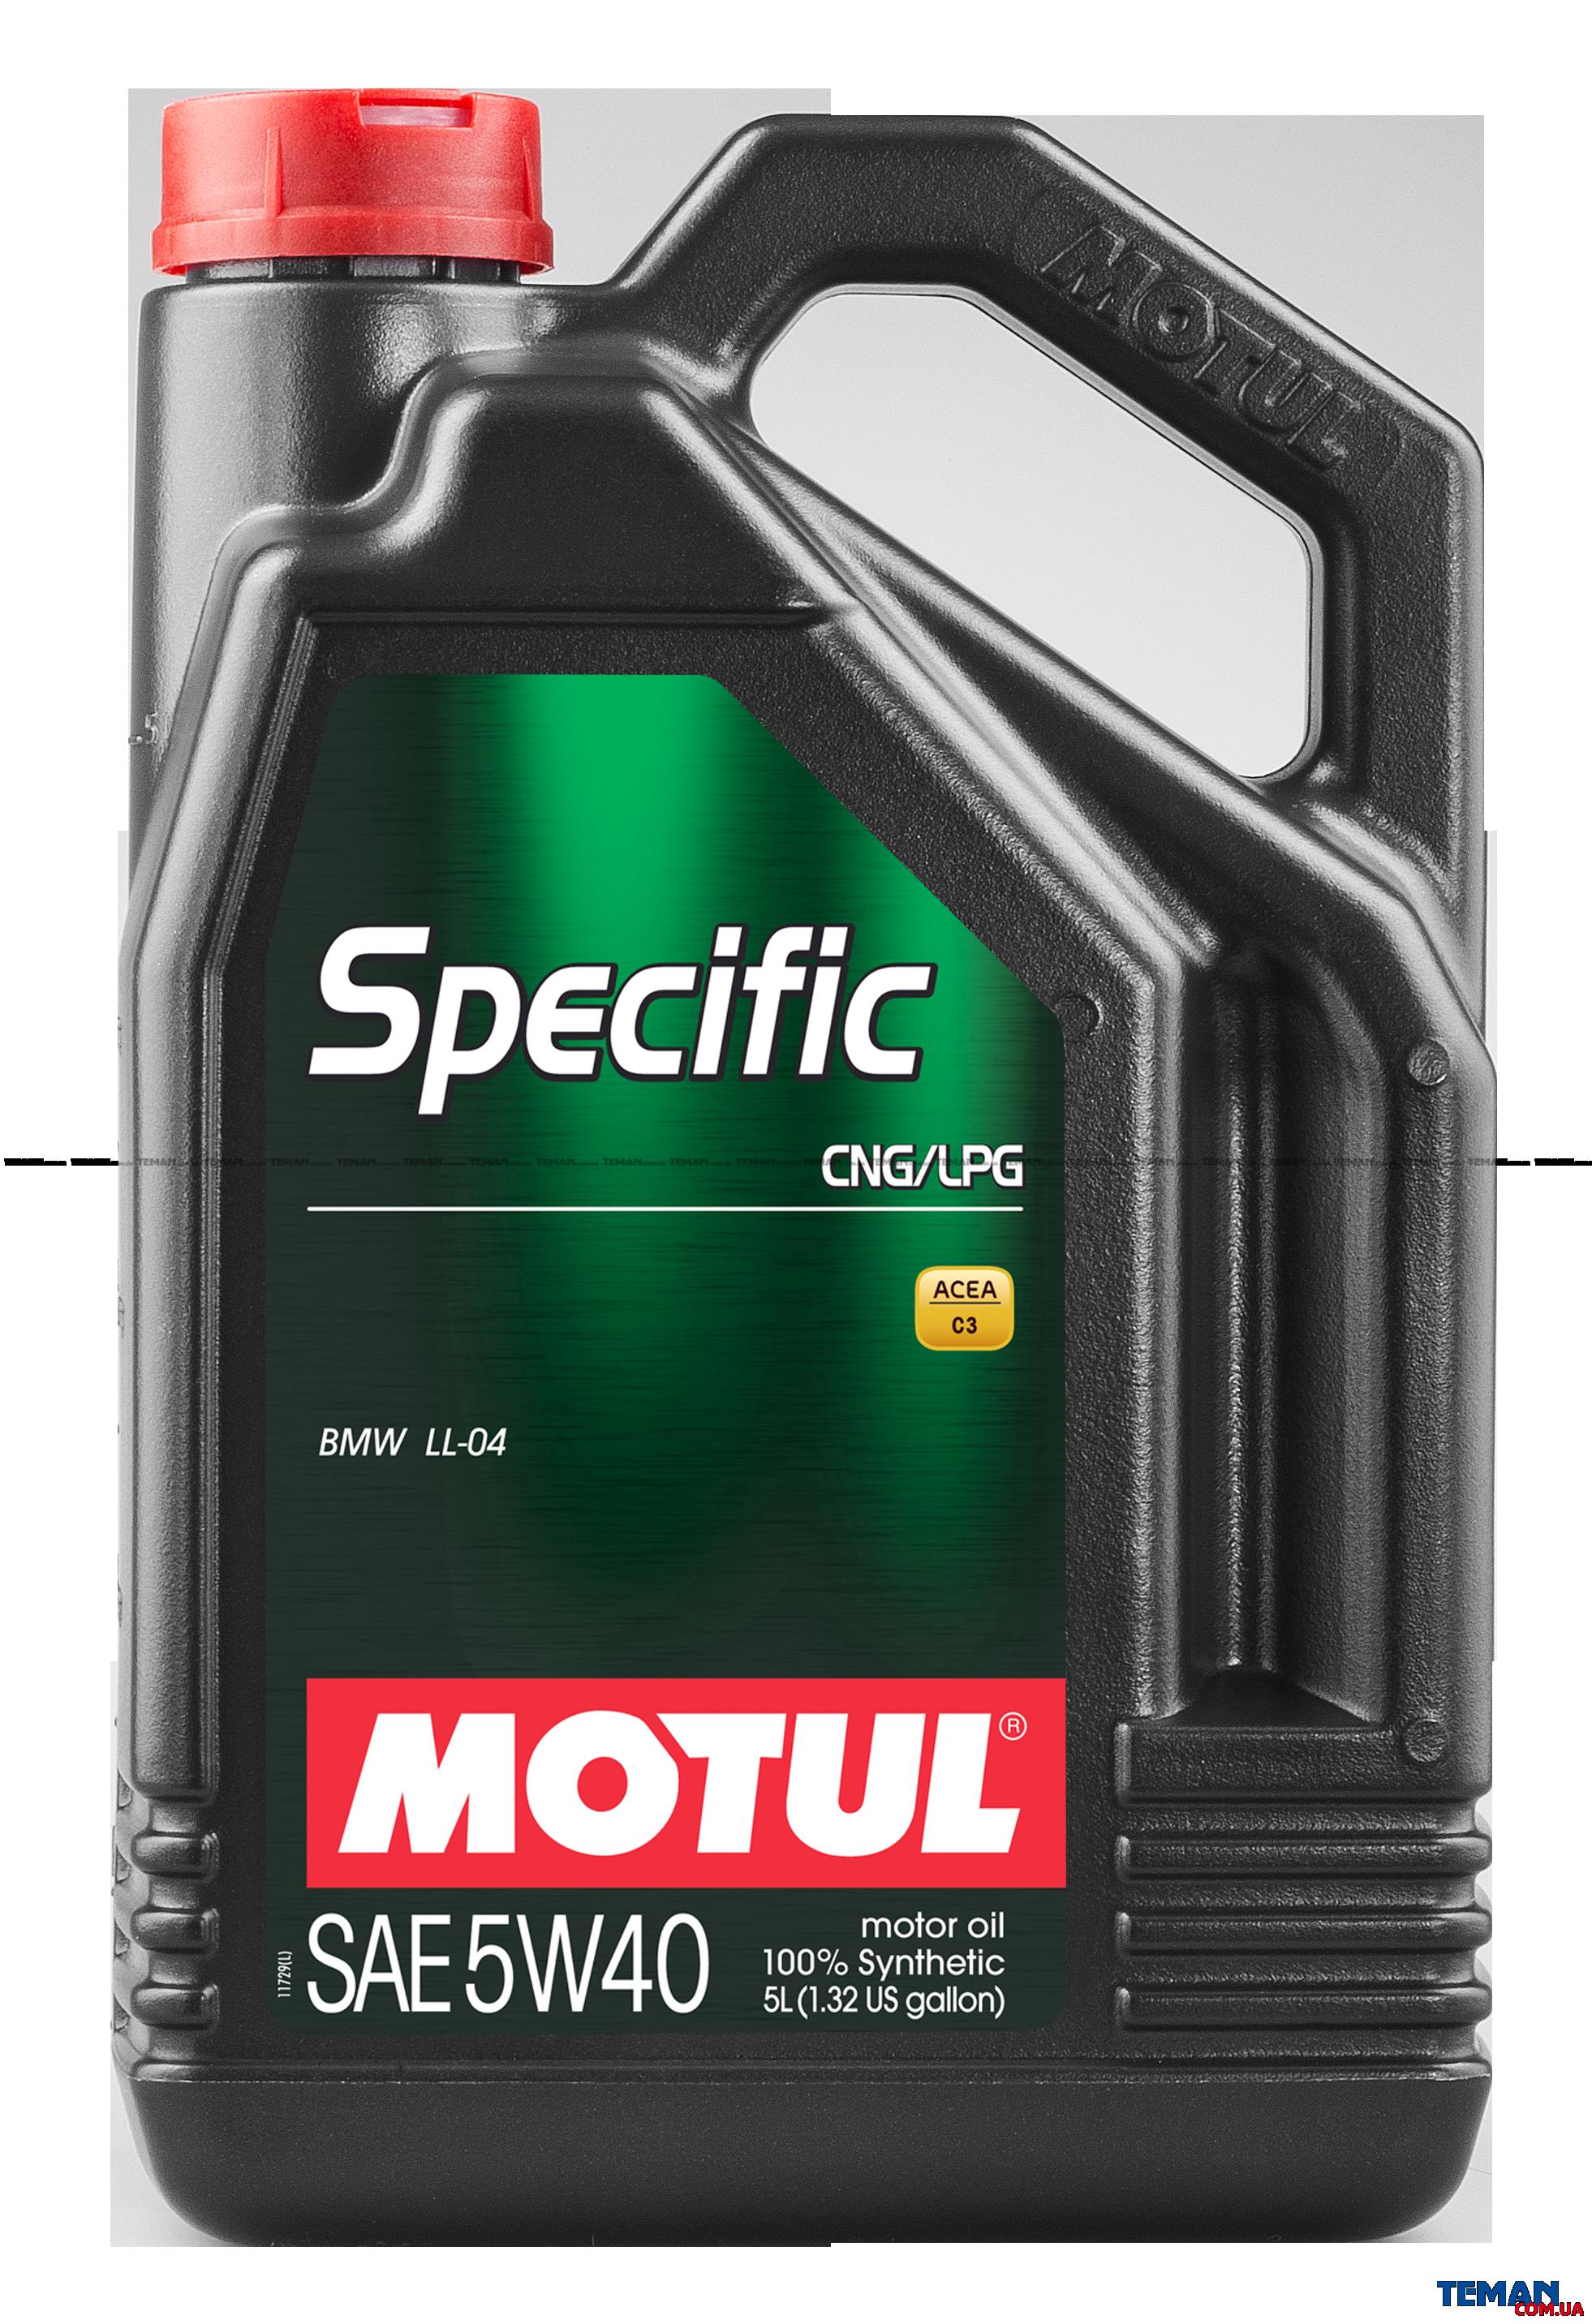 Синтетическое моторное масло SPECIFIC CNG/LPG 5W-40, 5 л